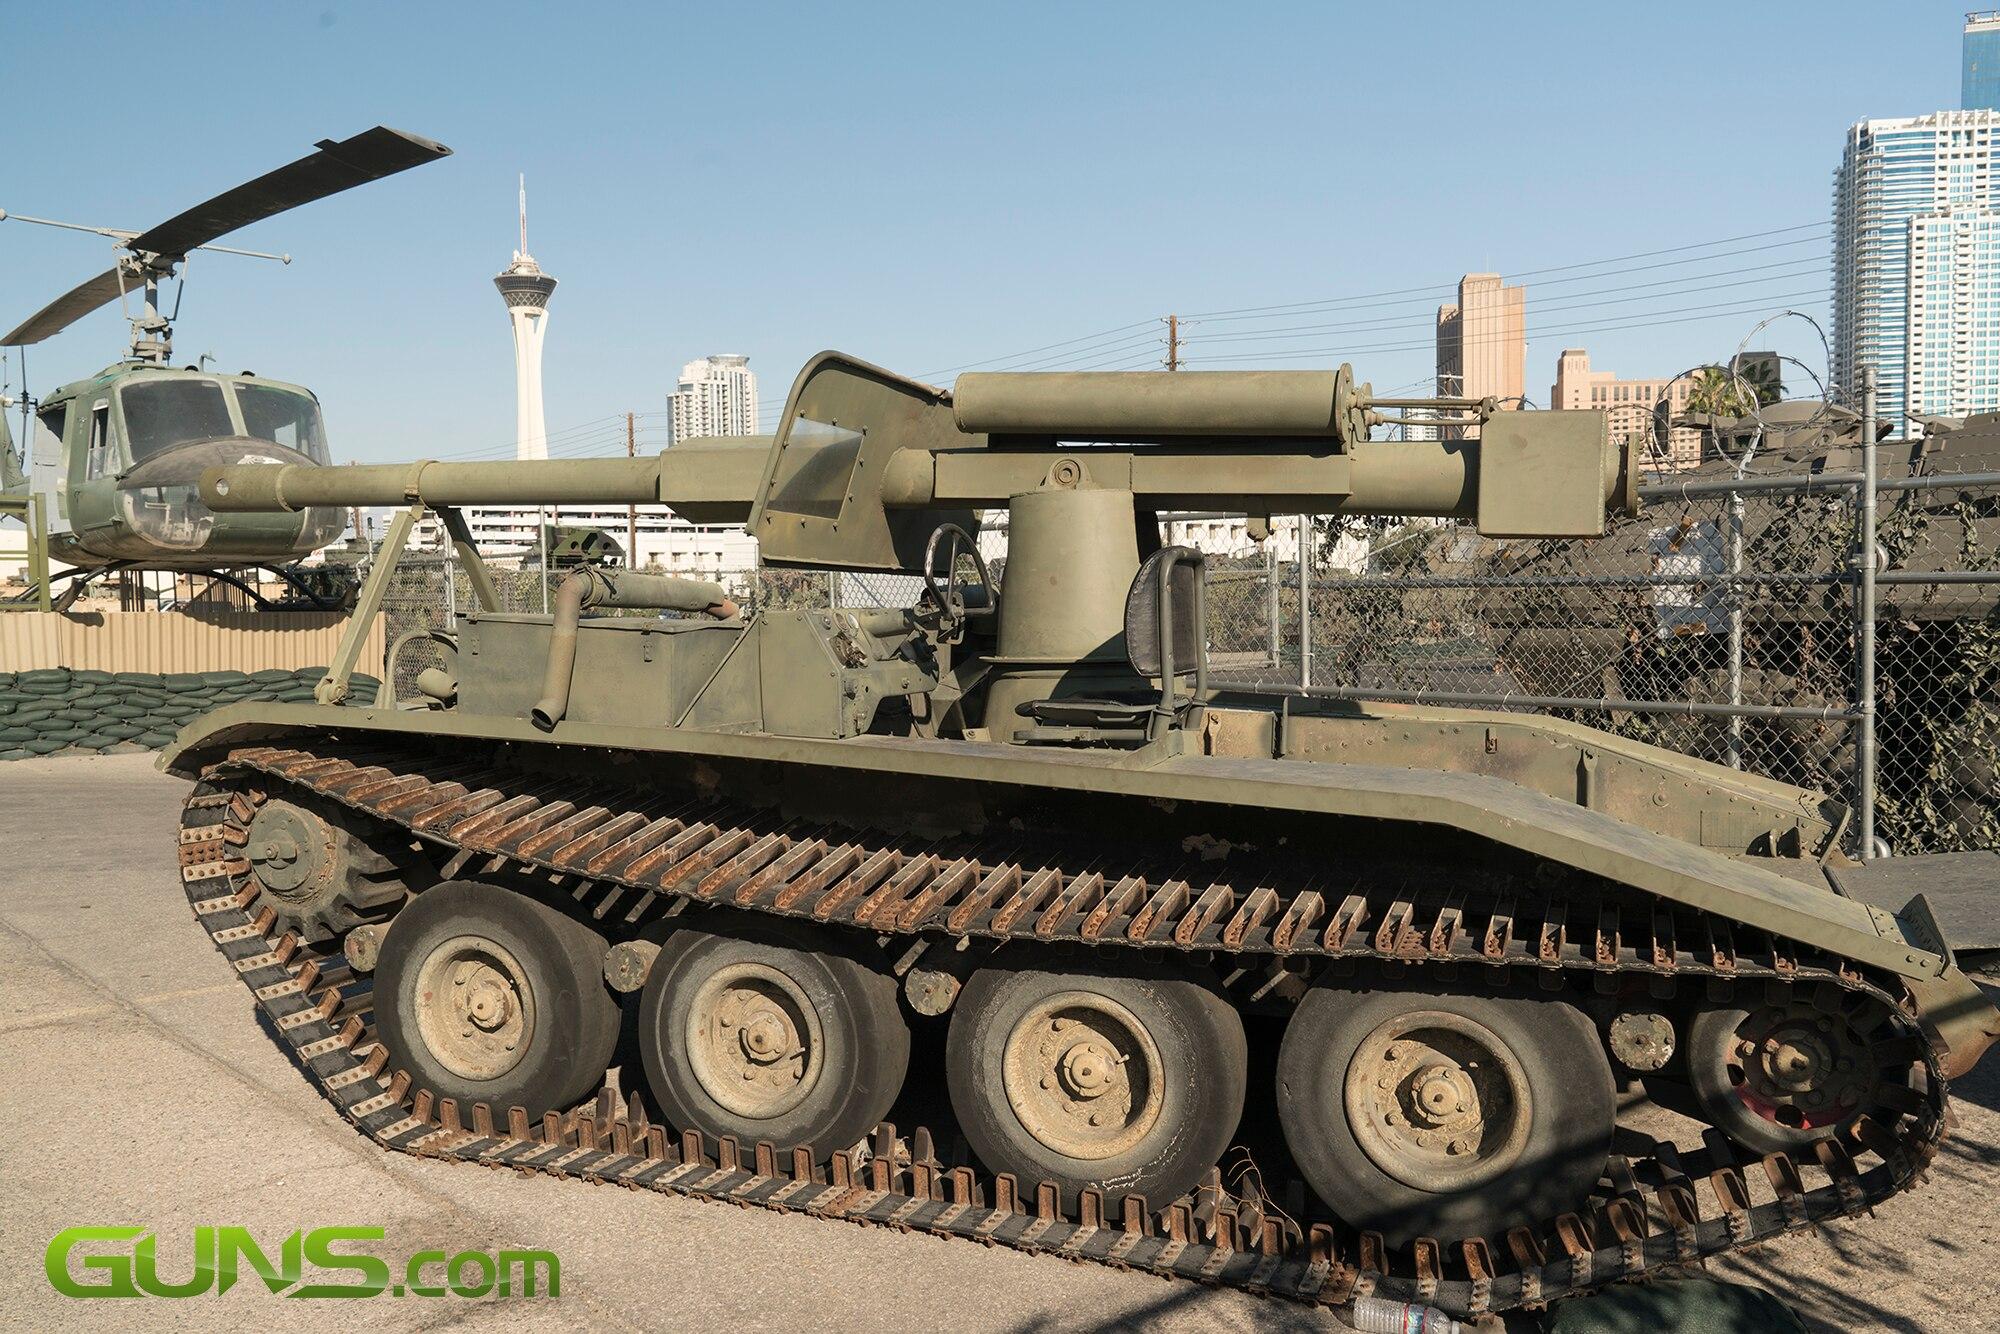 U.S. M-56 Self Propelled Anti-tank Gun